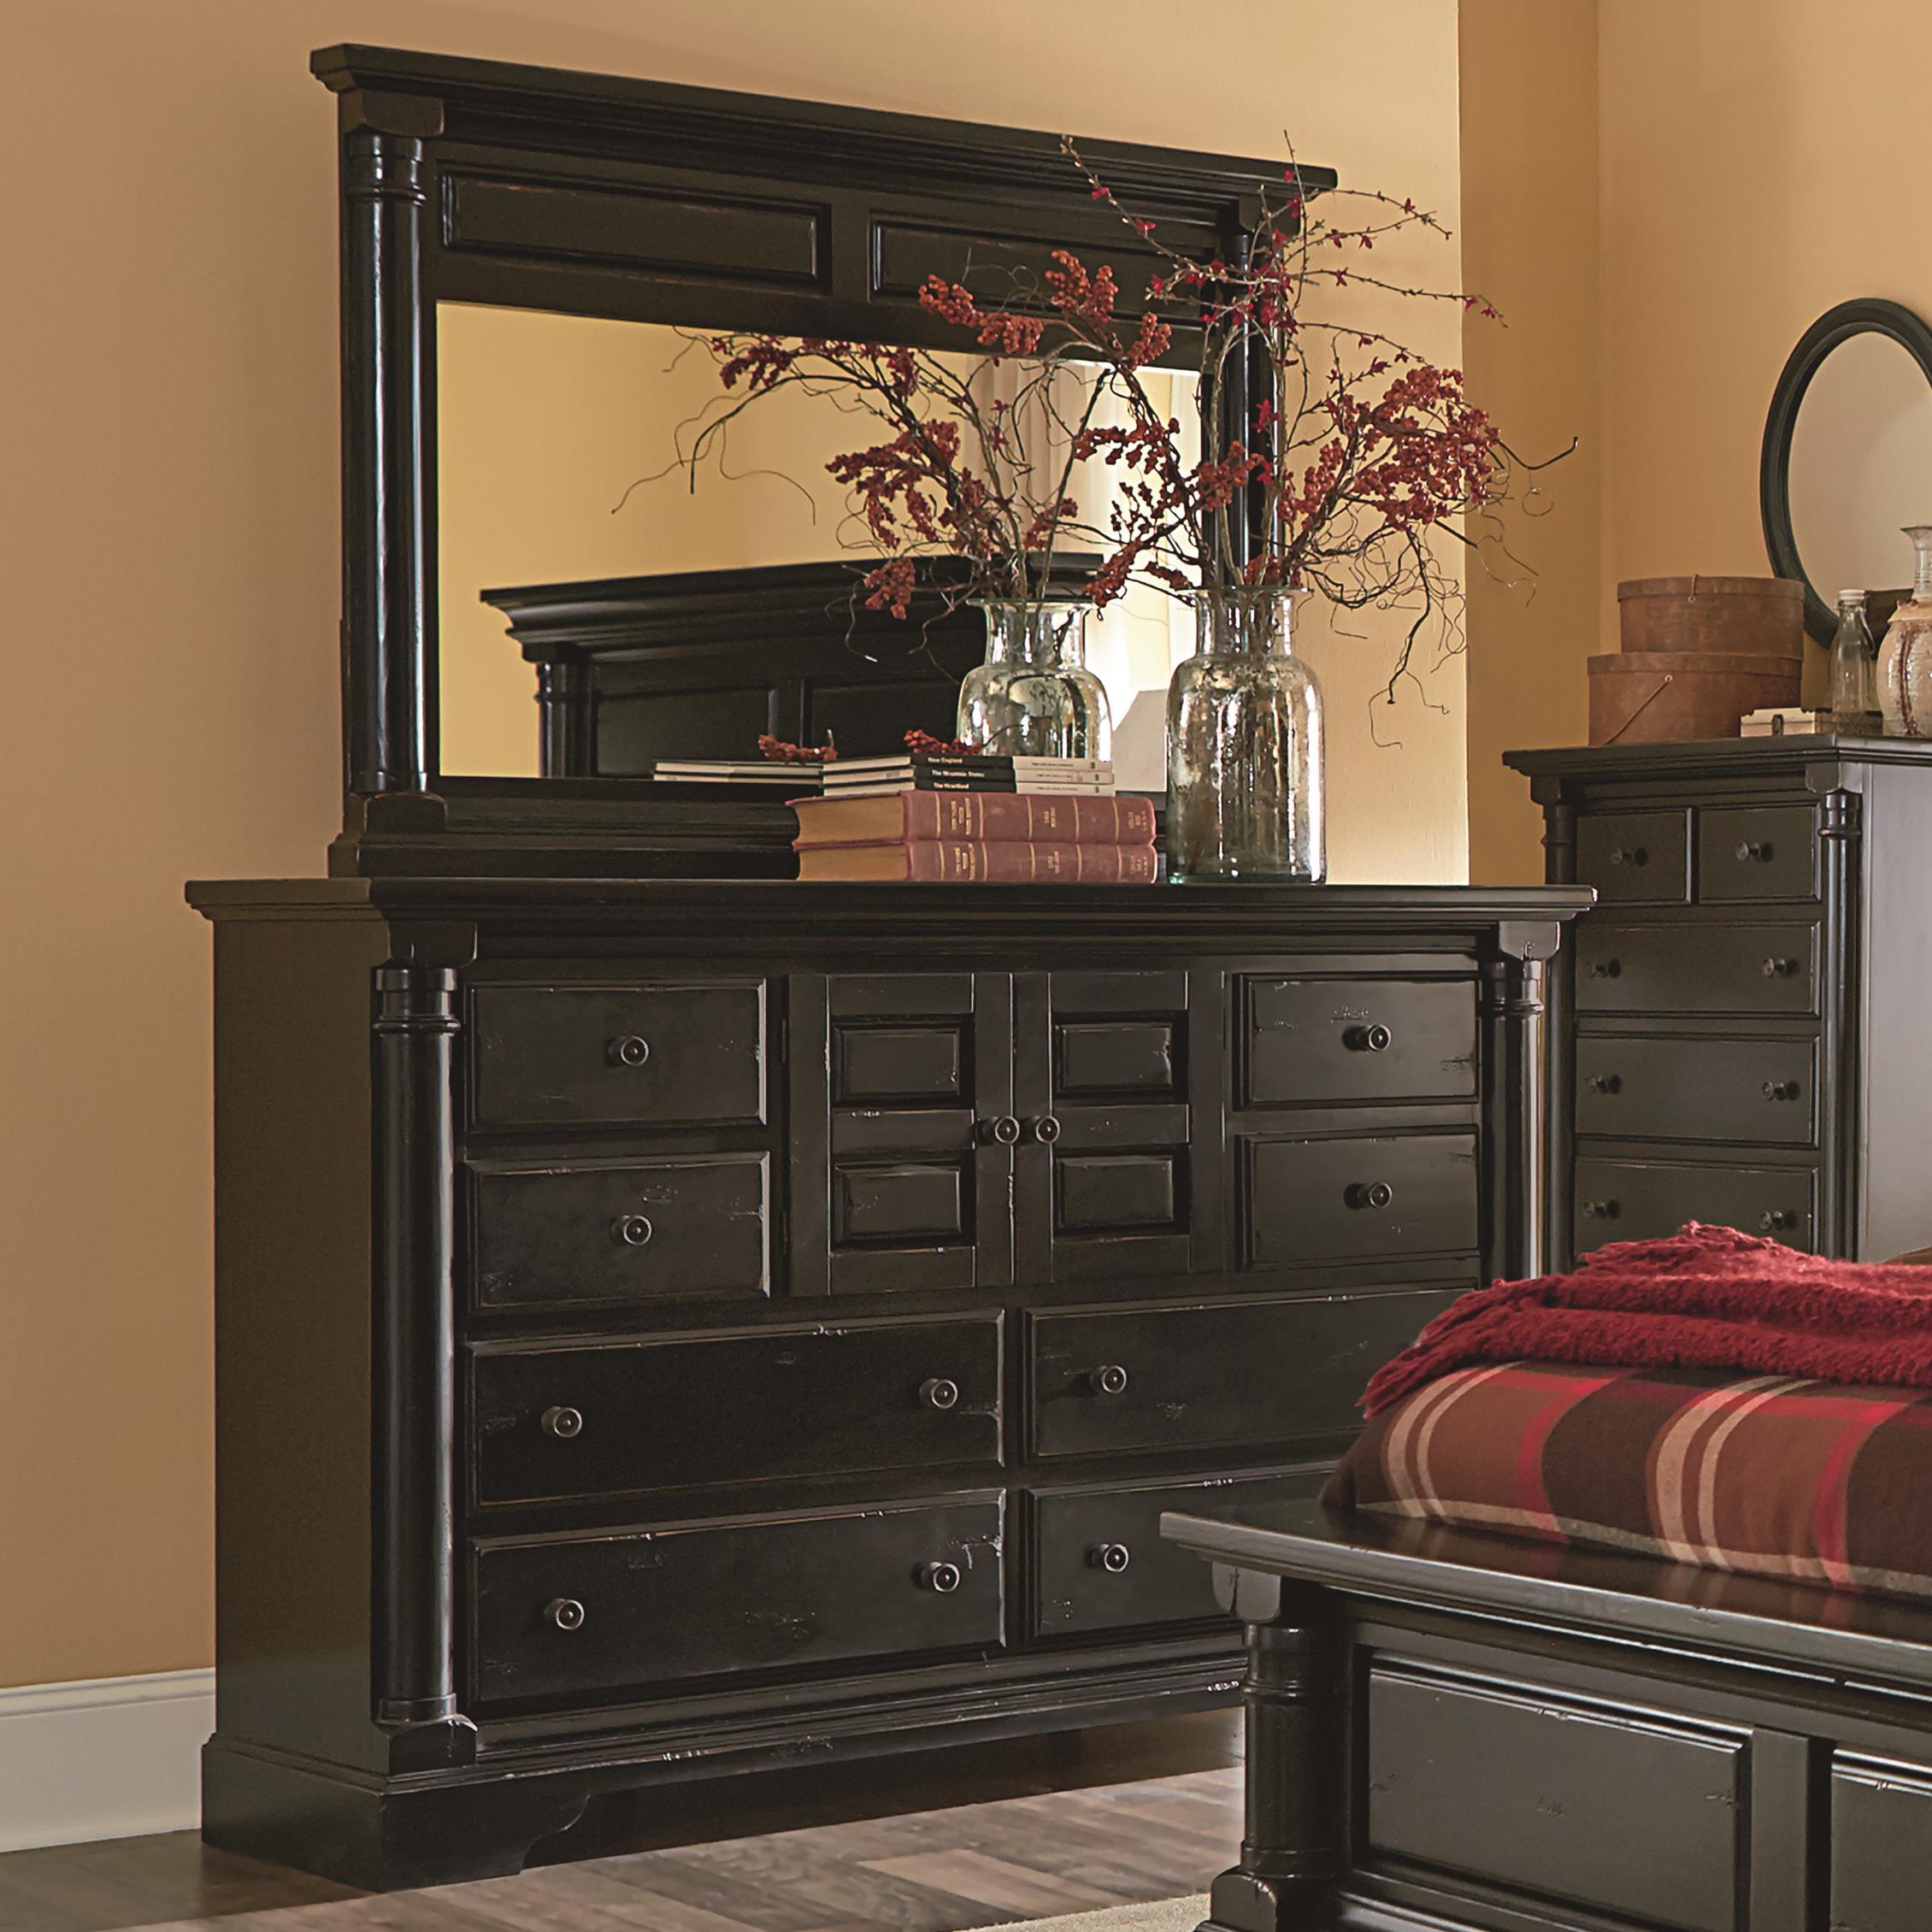 Progressive Furniture Gramercy Park Dresser and Mirror - Item Number: P659-50+24